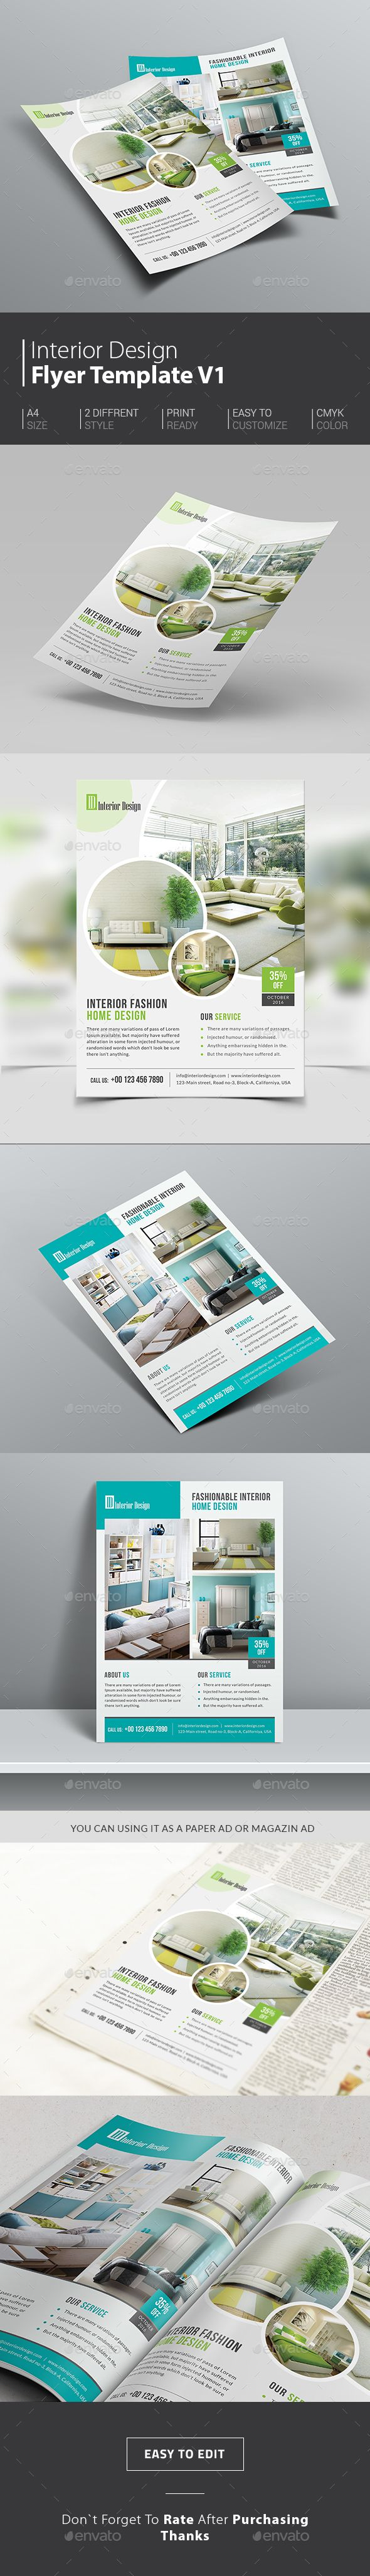 Interior Design Flyer Template-best trending design for bagging more clients.  http://graphicriver.net/item/interior-design-flyer/14911586?ref=themedevisers